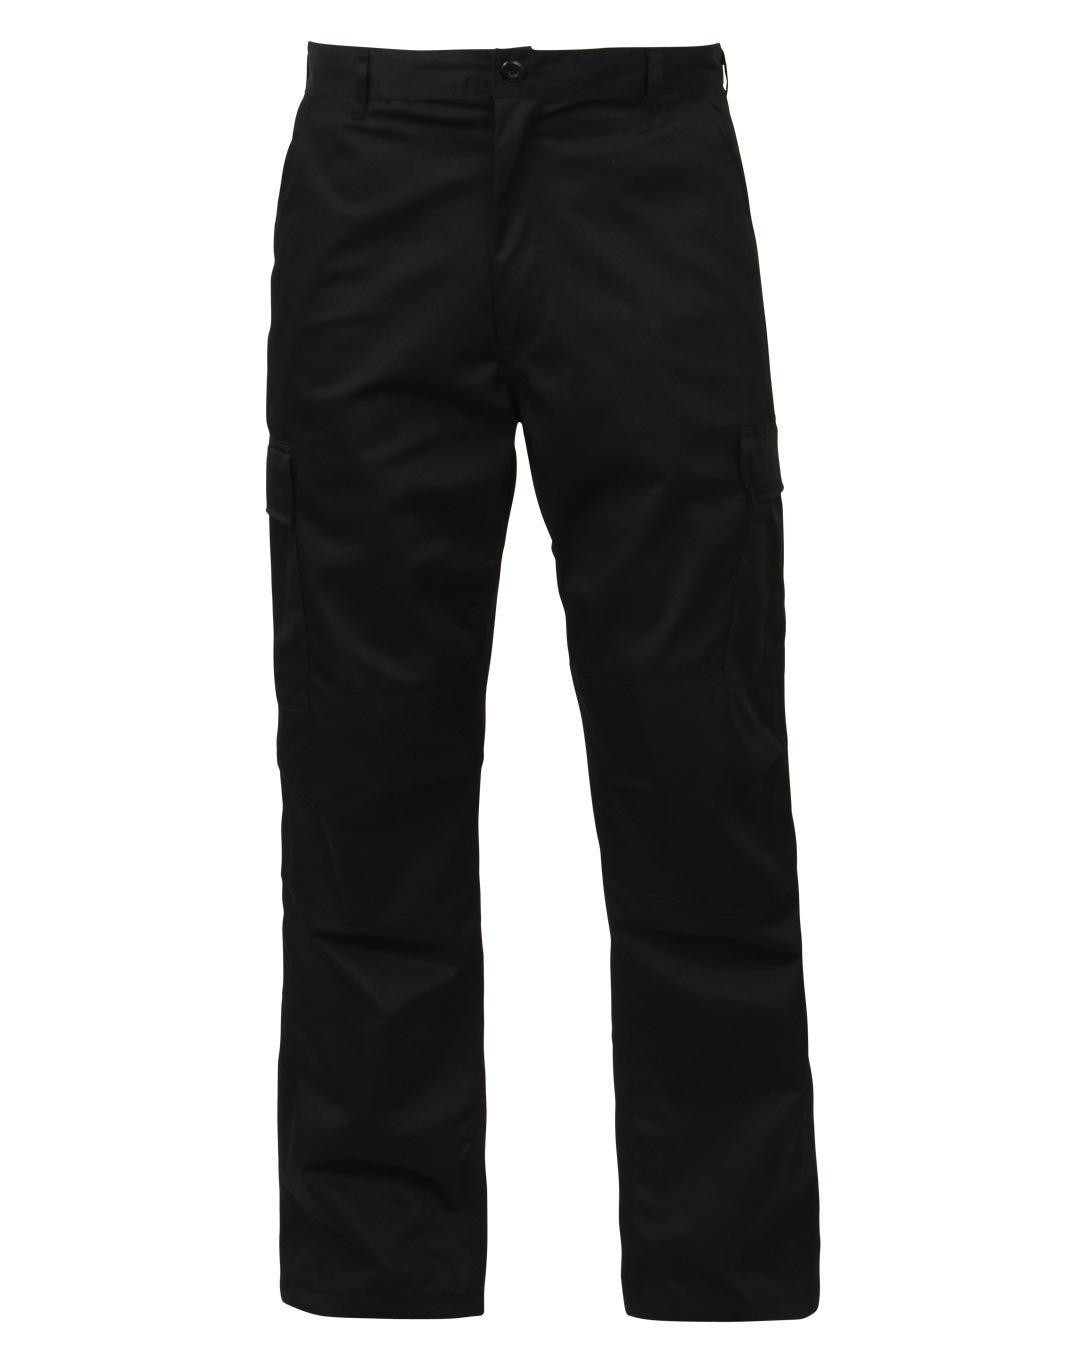 XiaoTianXinMen XTX Mens Work Pockets Long Sleeve Military Button Up Basic Shirts